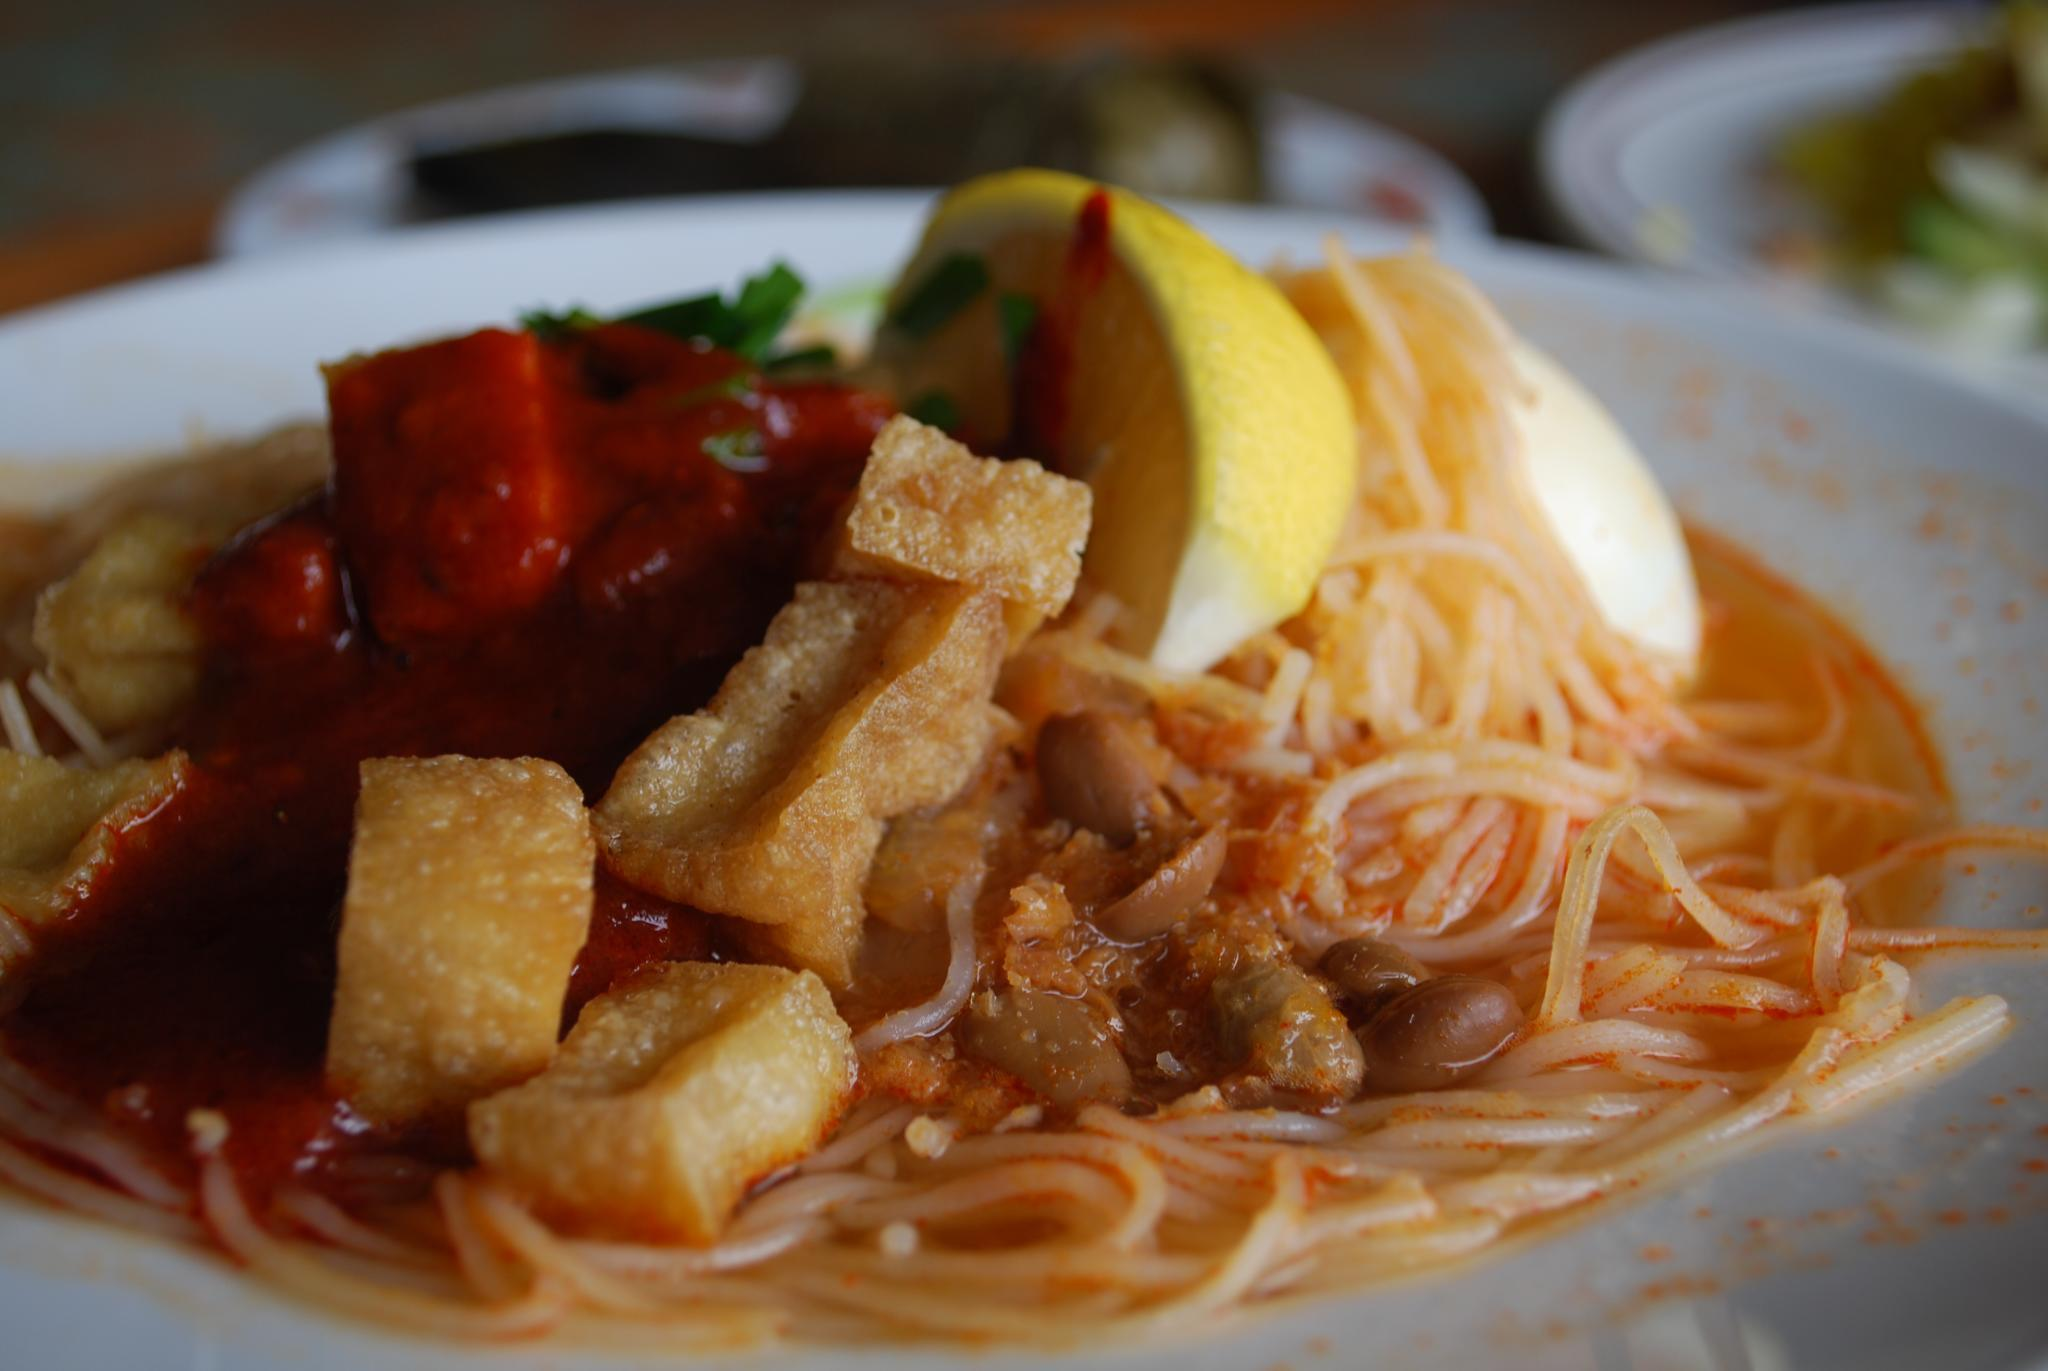 Singaporean Cuisine List of 10 of the Most Popular Singaporean Dishes